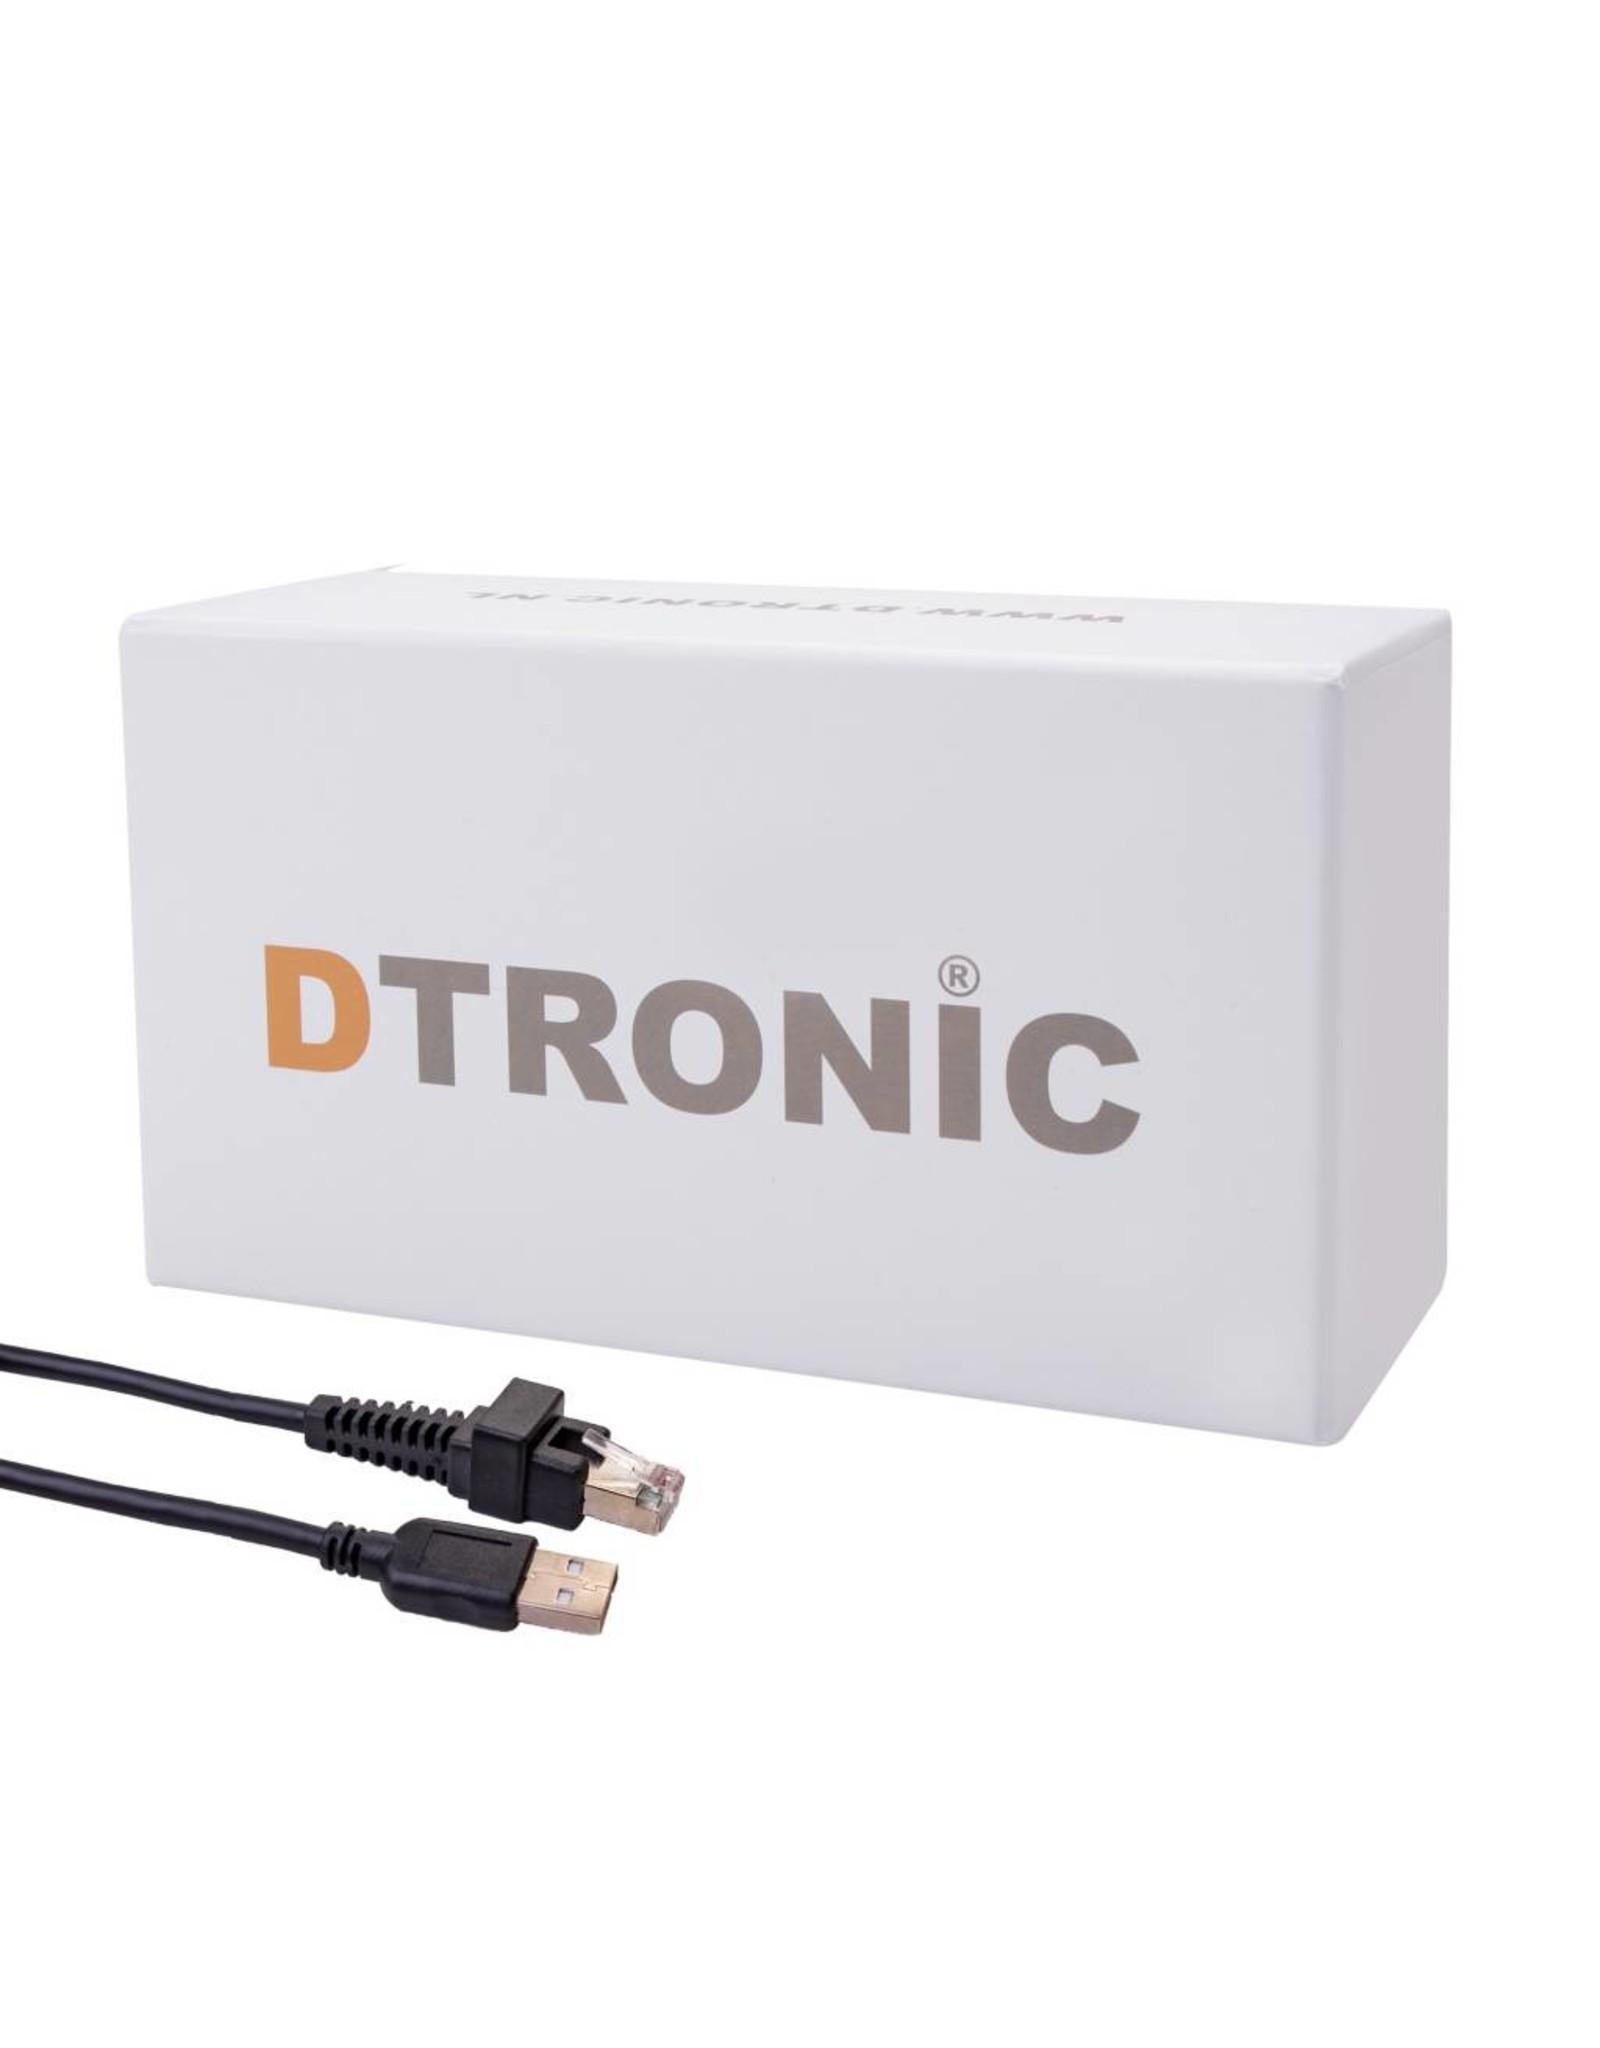 DTRONIC DTRONIC - USB 2